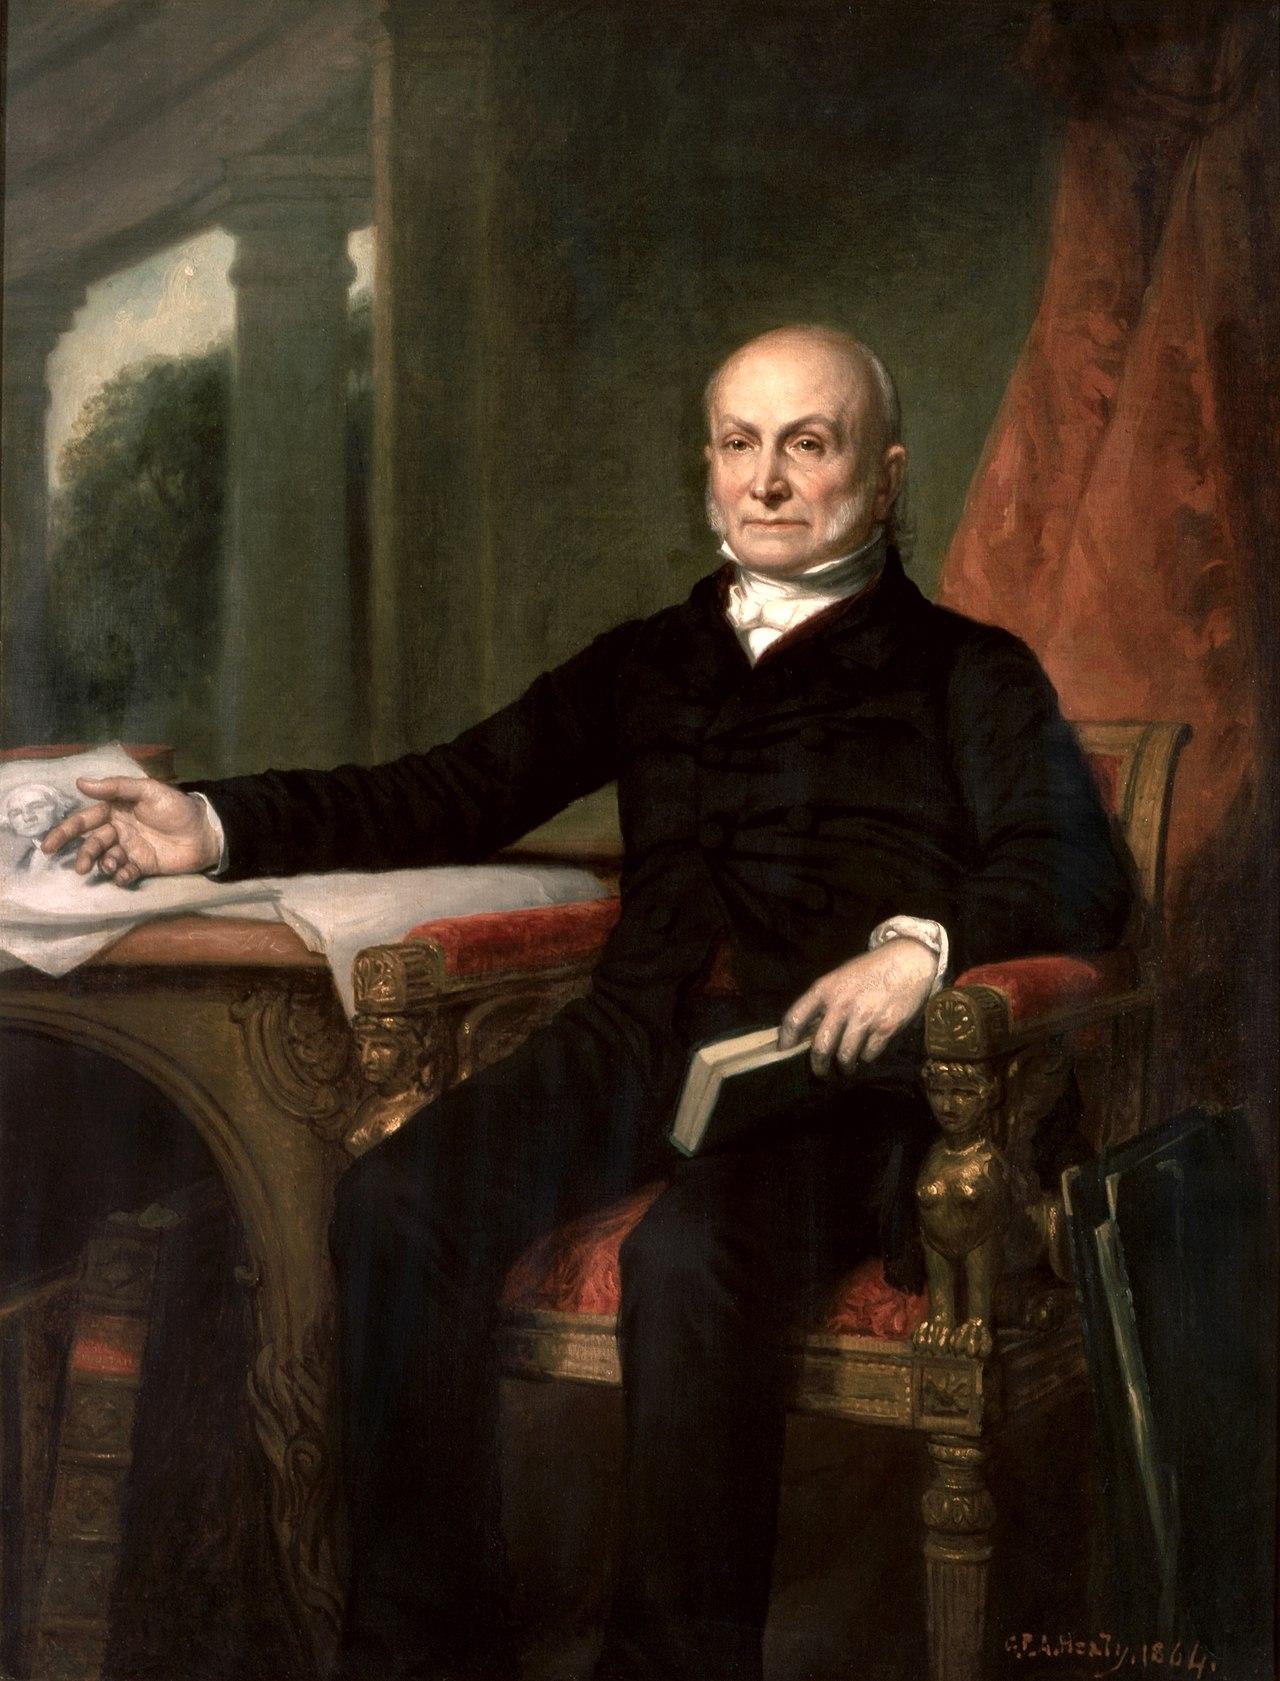 John Quincy Adams, painted by George Peter Alexander Healy (Wikimedia)